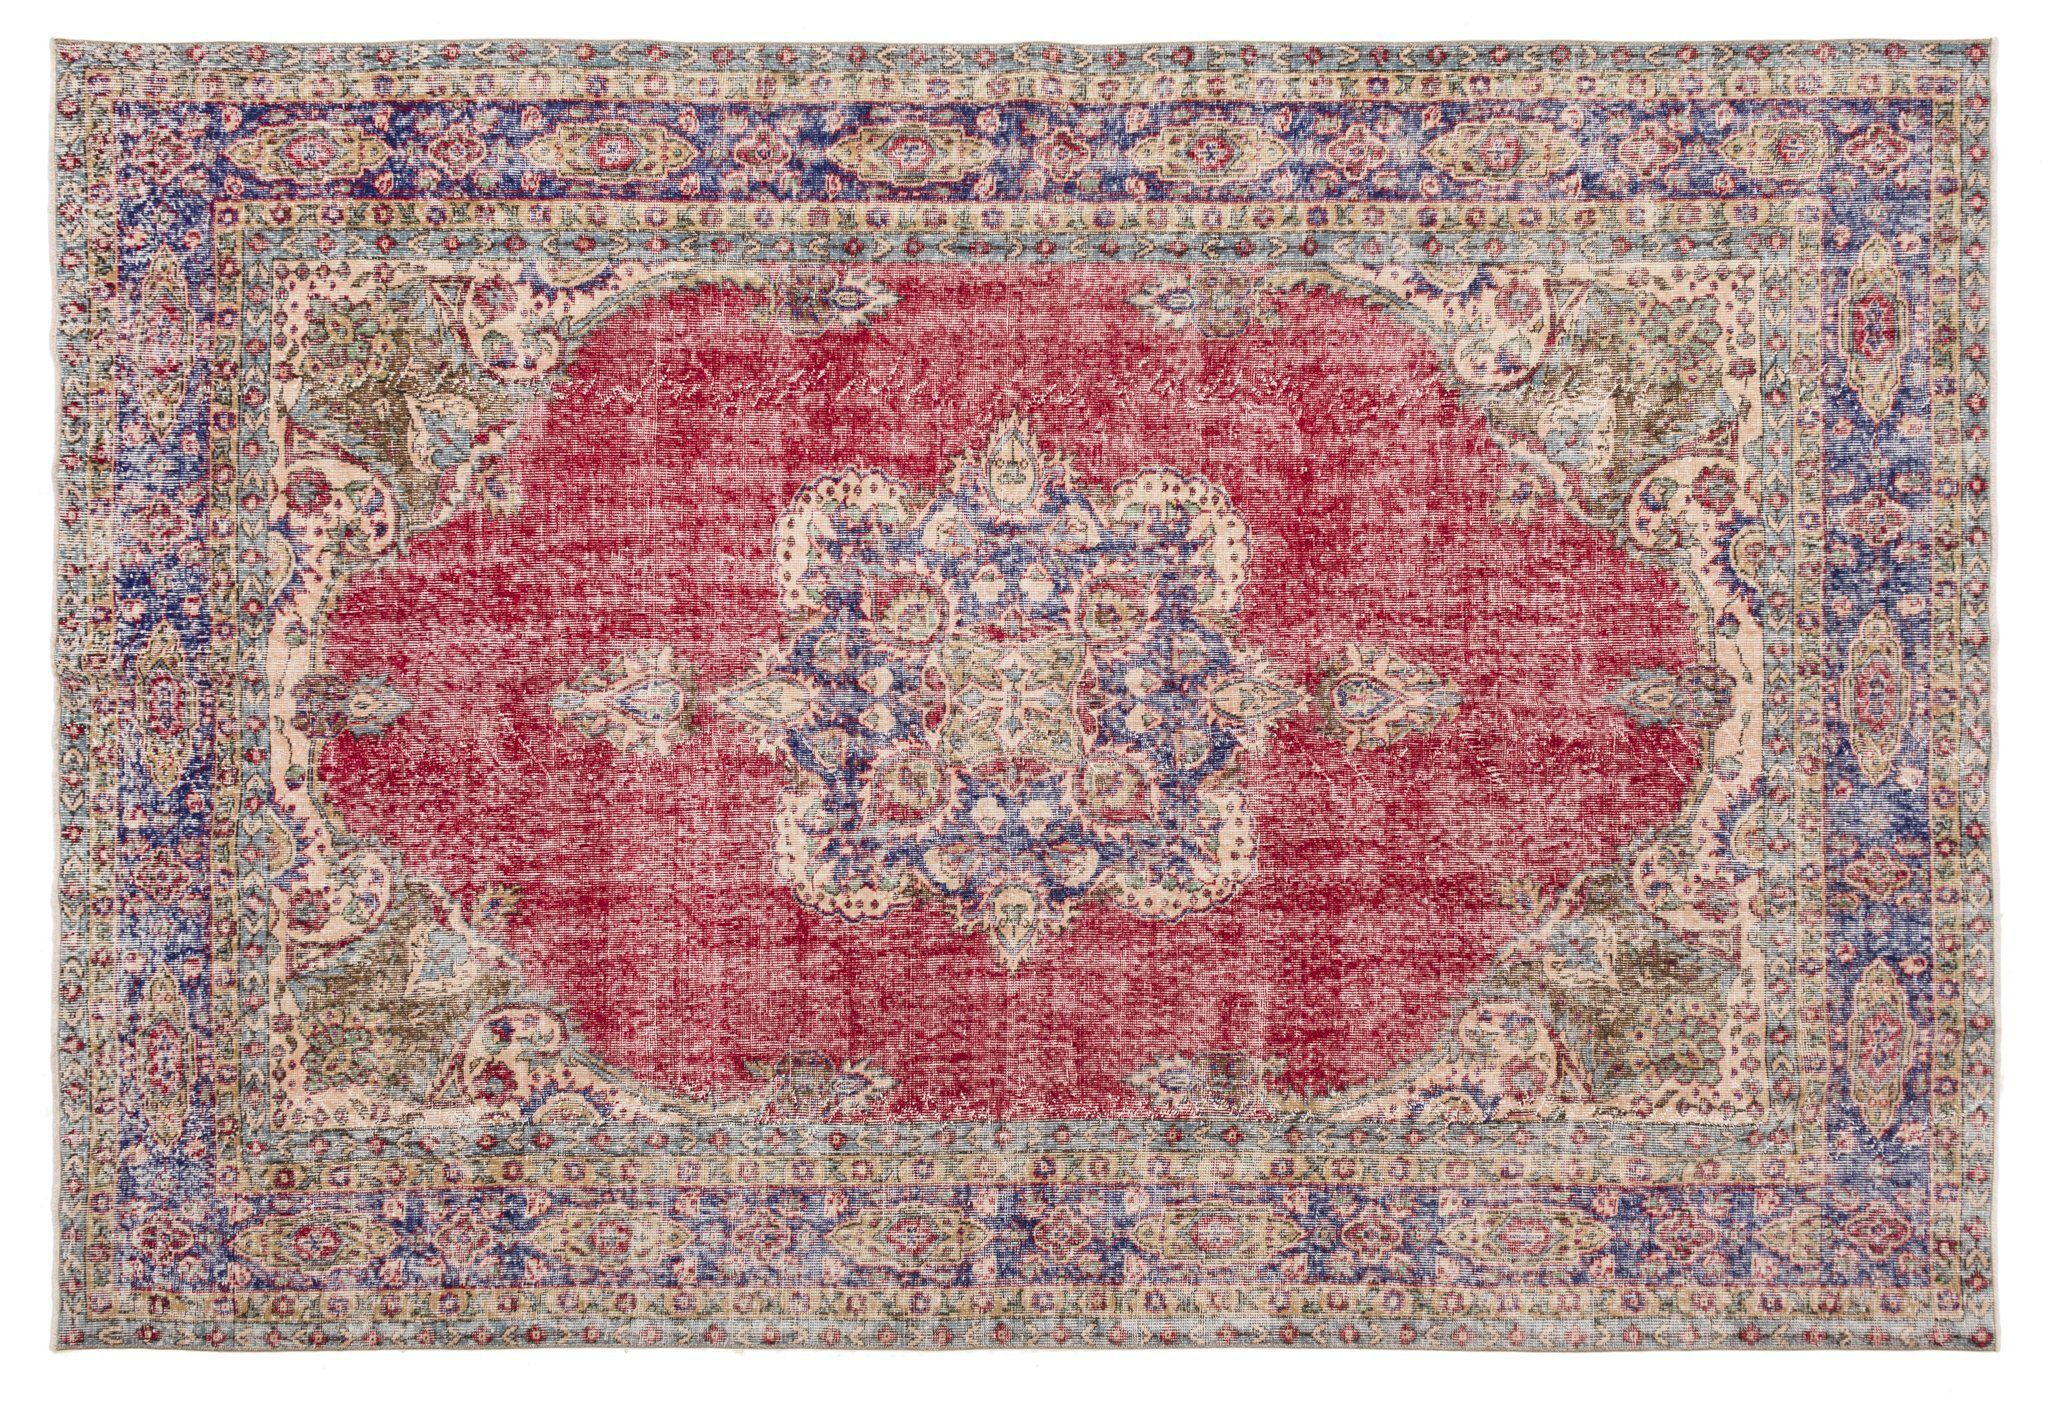 Ashling Red Persian Vintage Handmade Oriental Wool Area Rug Revival Rugs Wool Area Rugs Persian Motifs Isparta